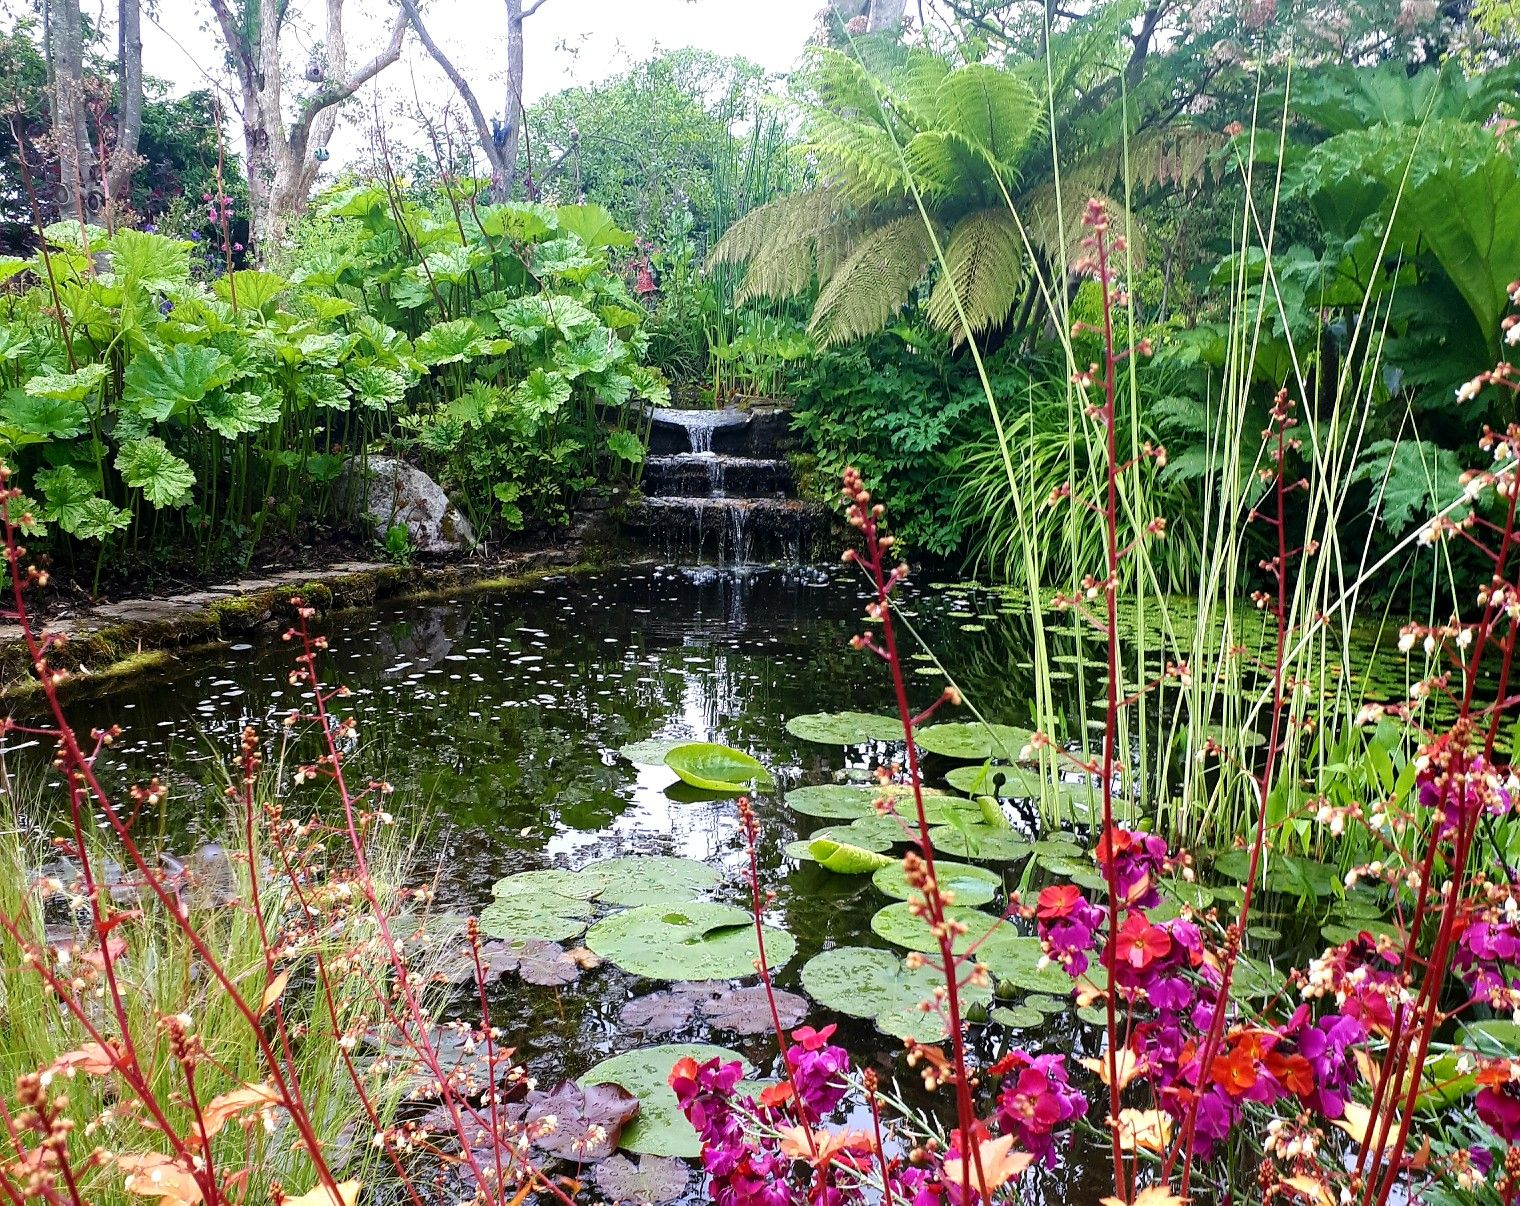 Terra Nova Gardens Co Limerick Ireland (With images ...